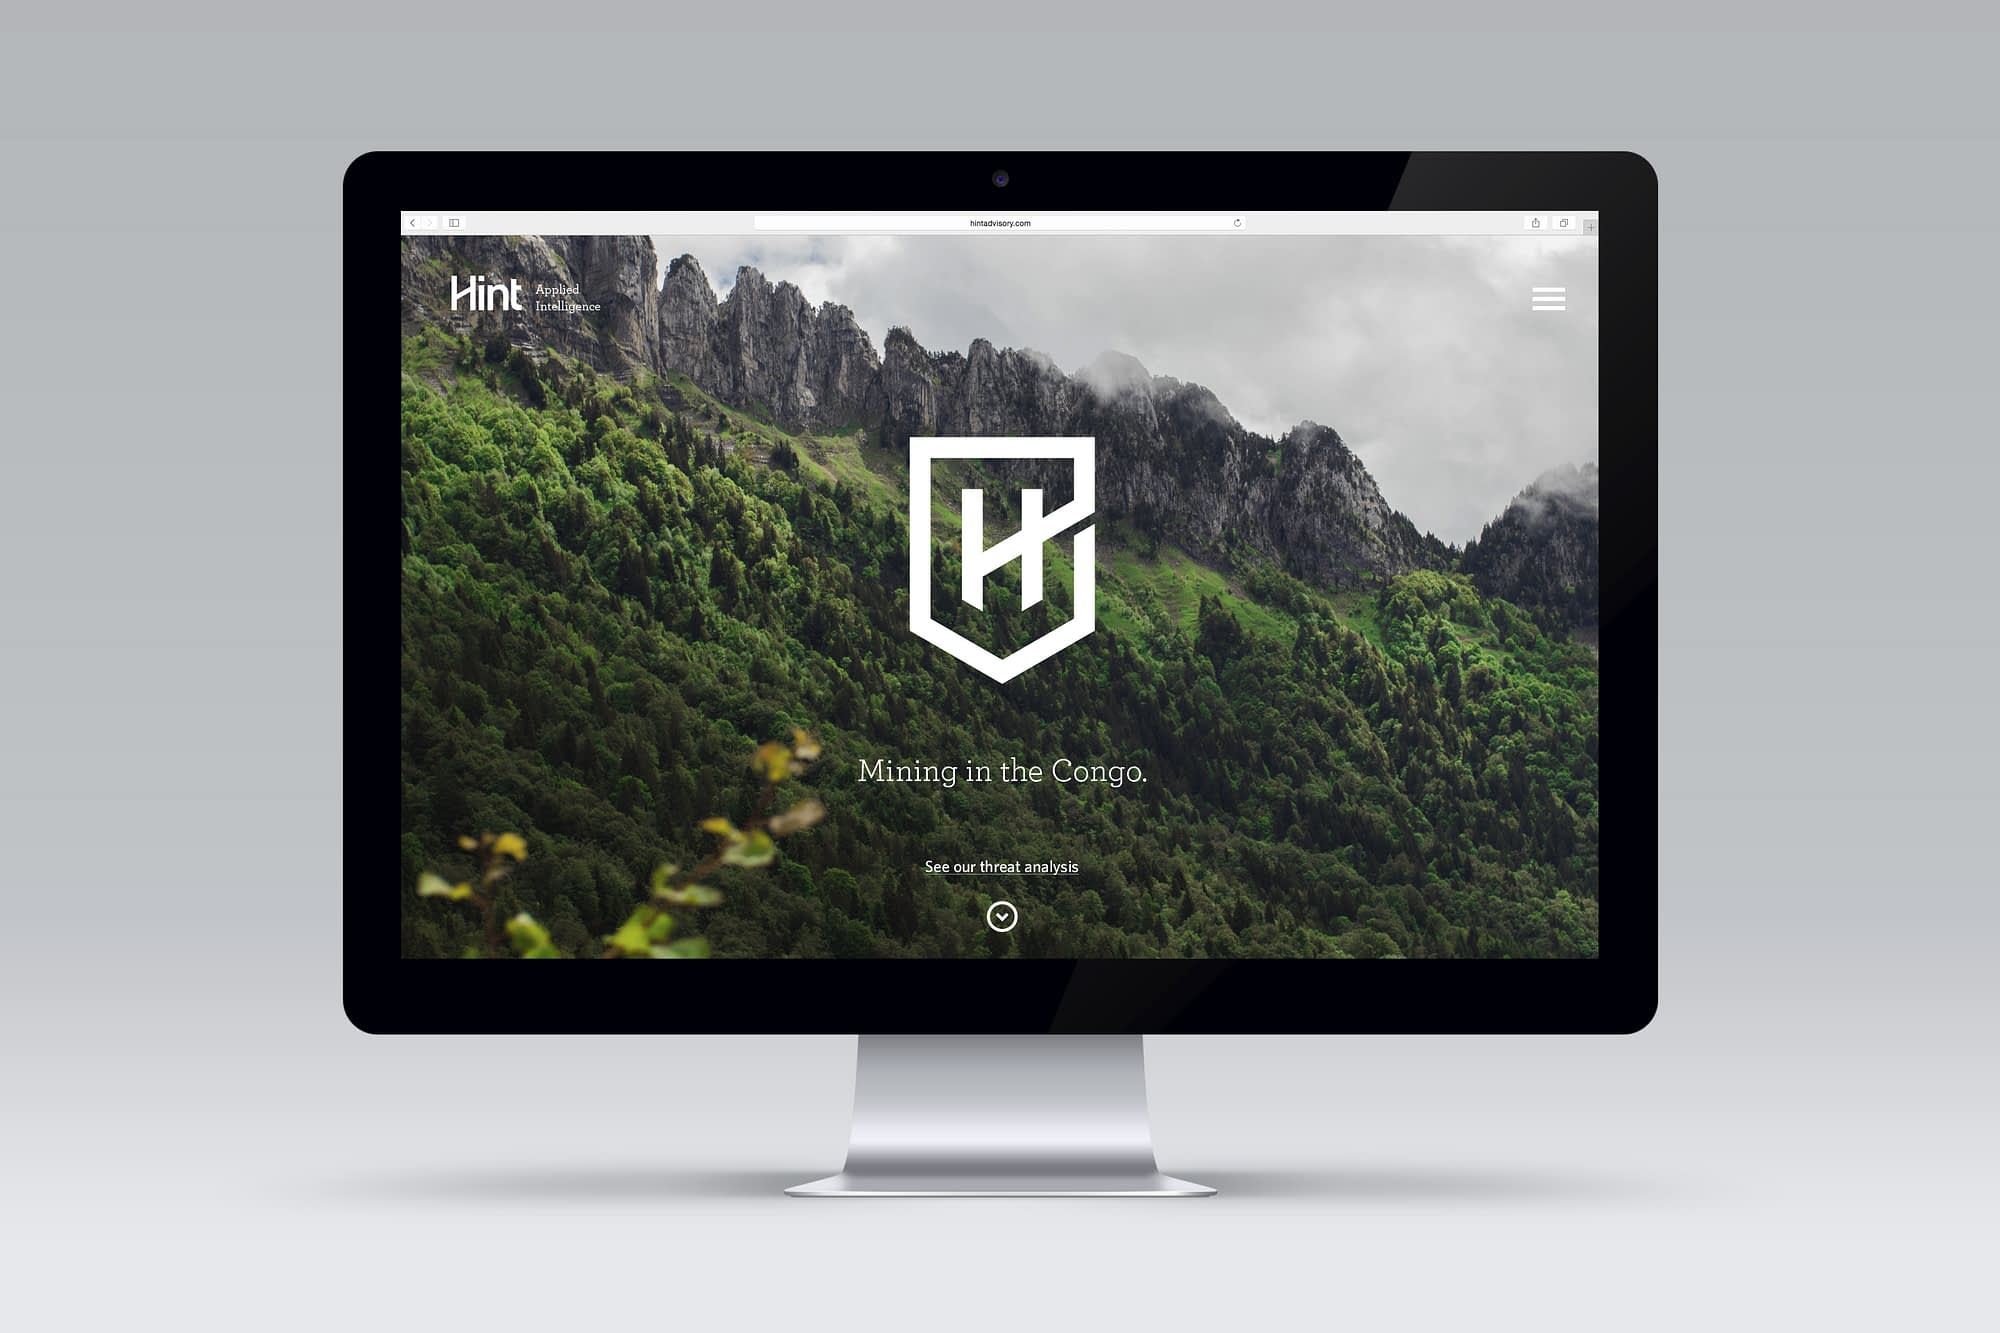 Hint website